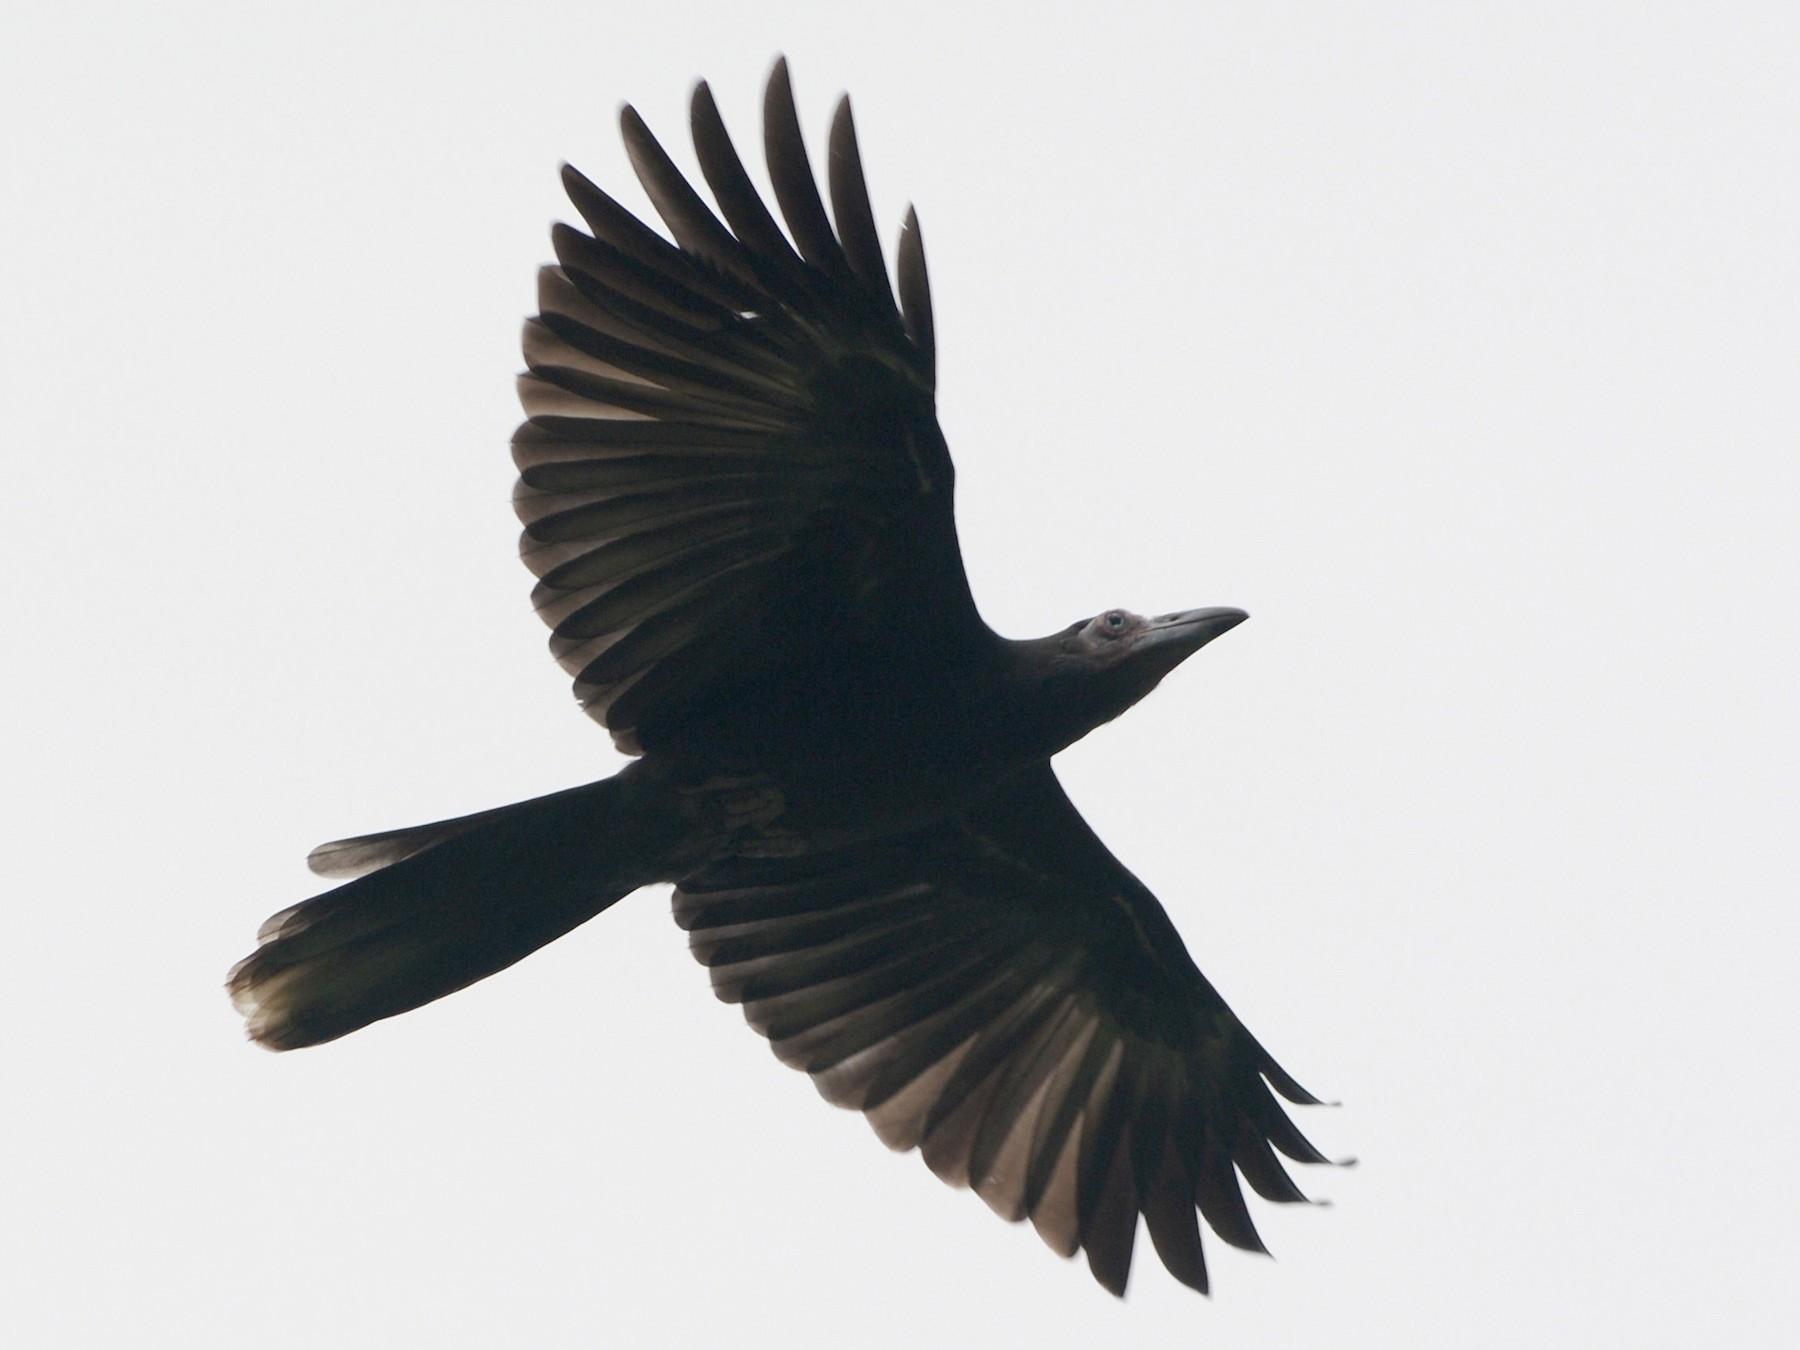 Gray Crow - Cathy Pasterczyk